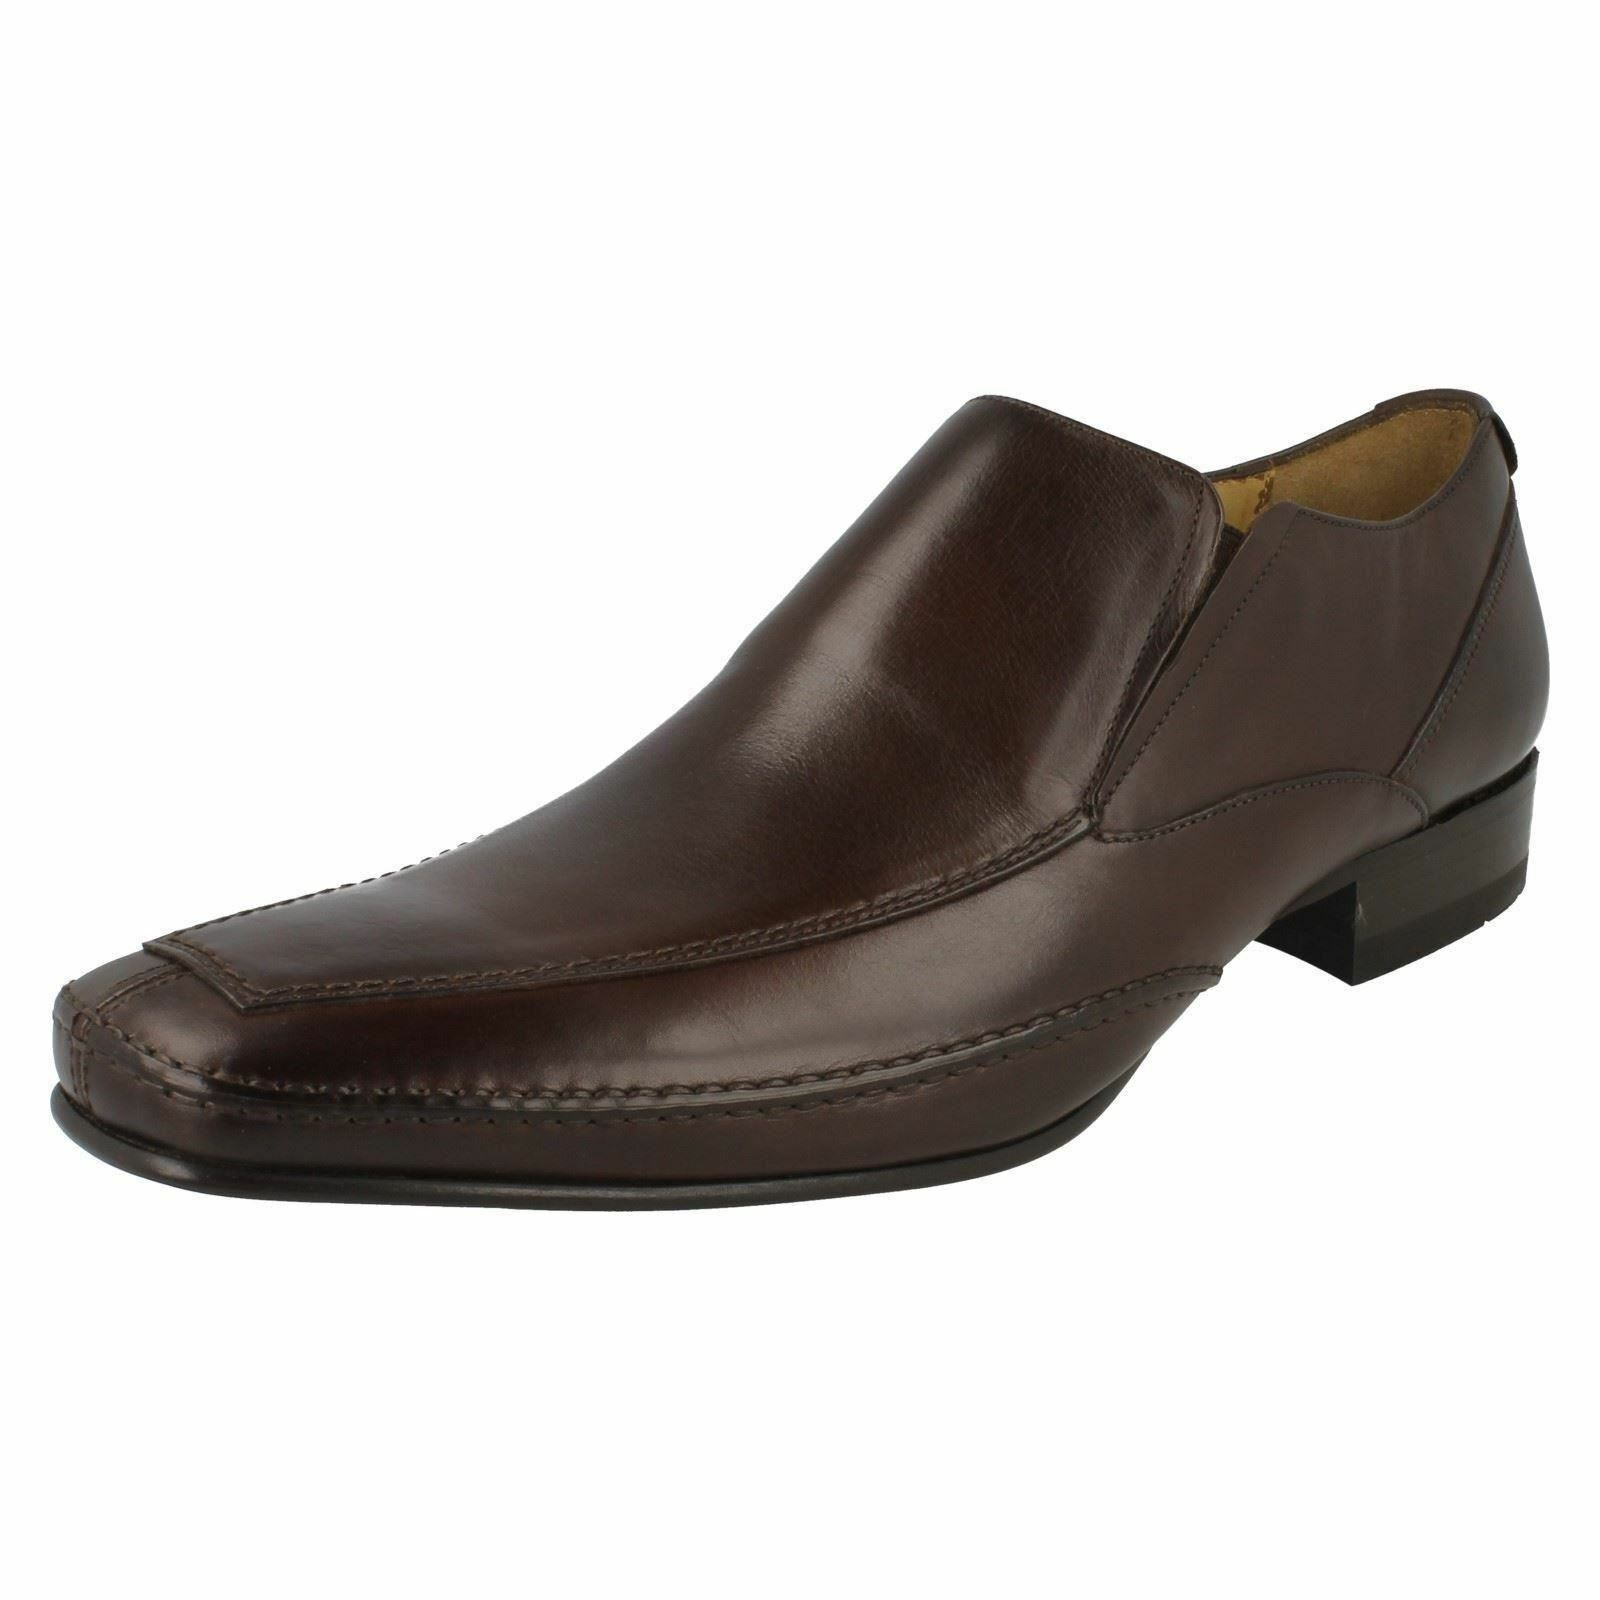 Herren DESIGN LOAKE FORMAL SLIP ON FORMA SMART Schuhe MATTHEWS DARK BROWN LEATHER